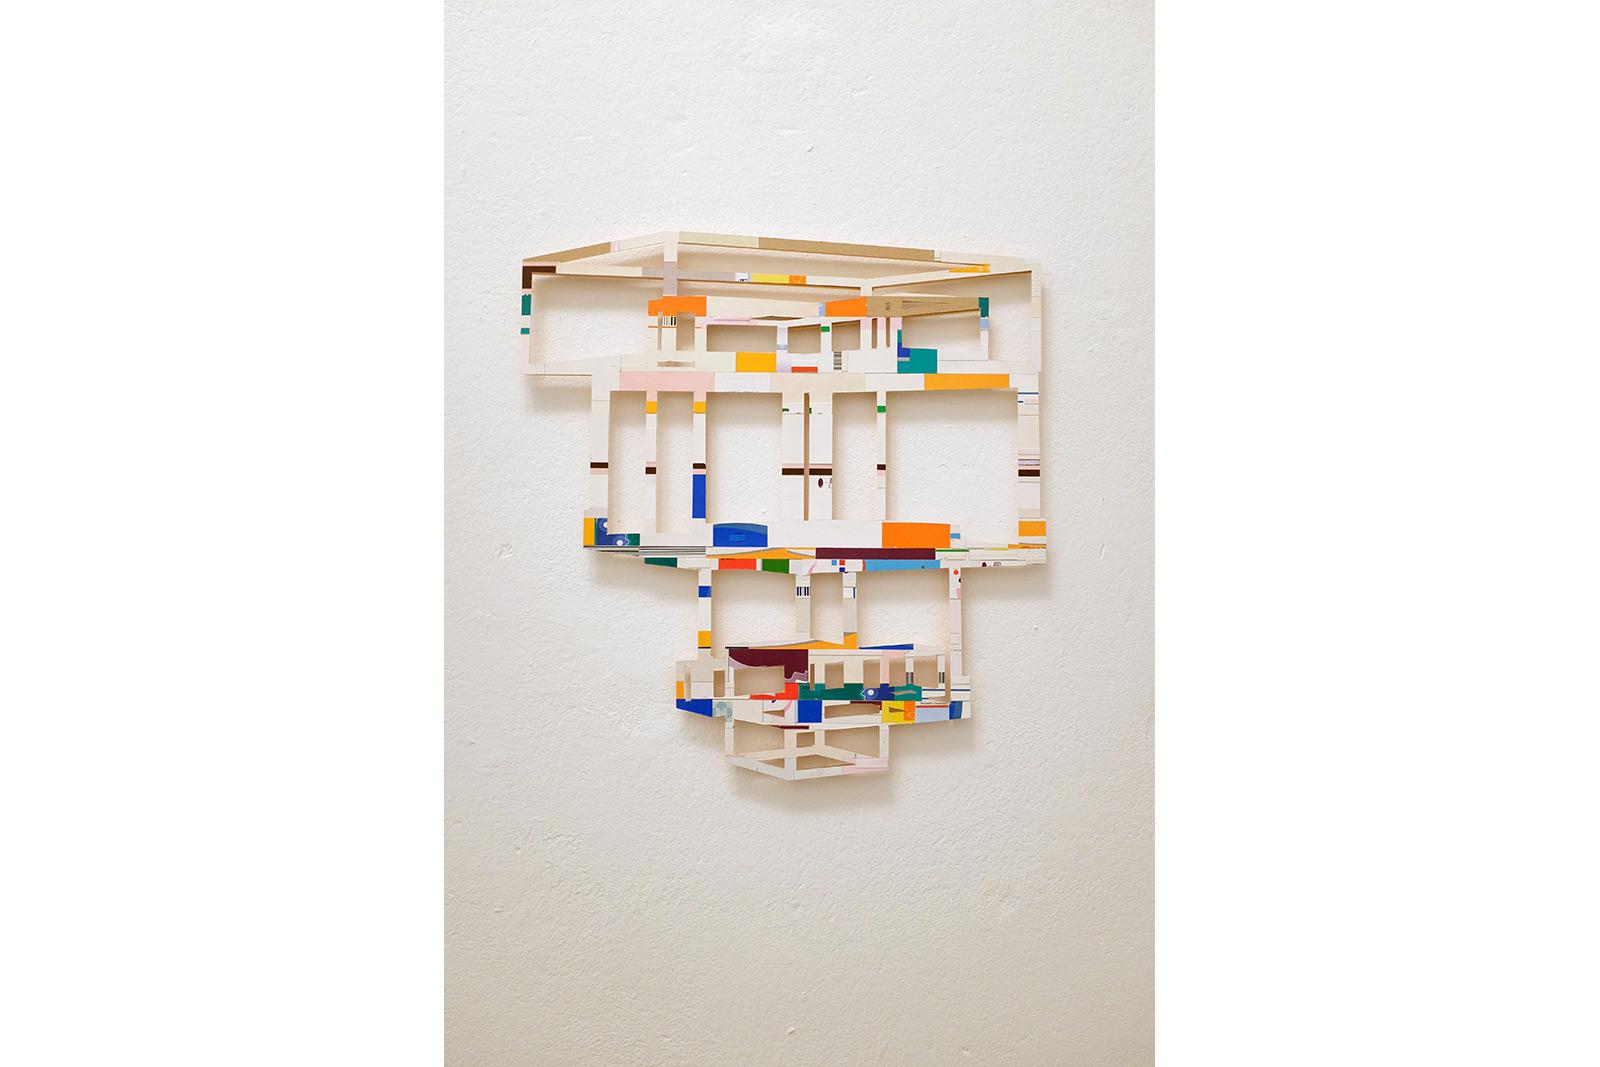 collage, medicin box, wallpiece